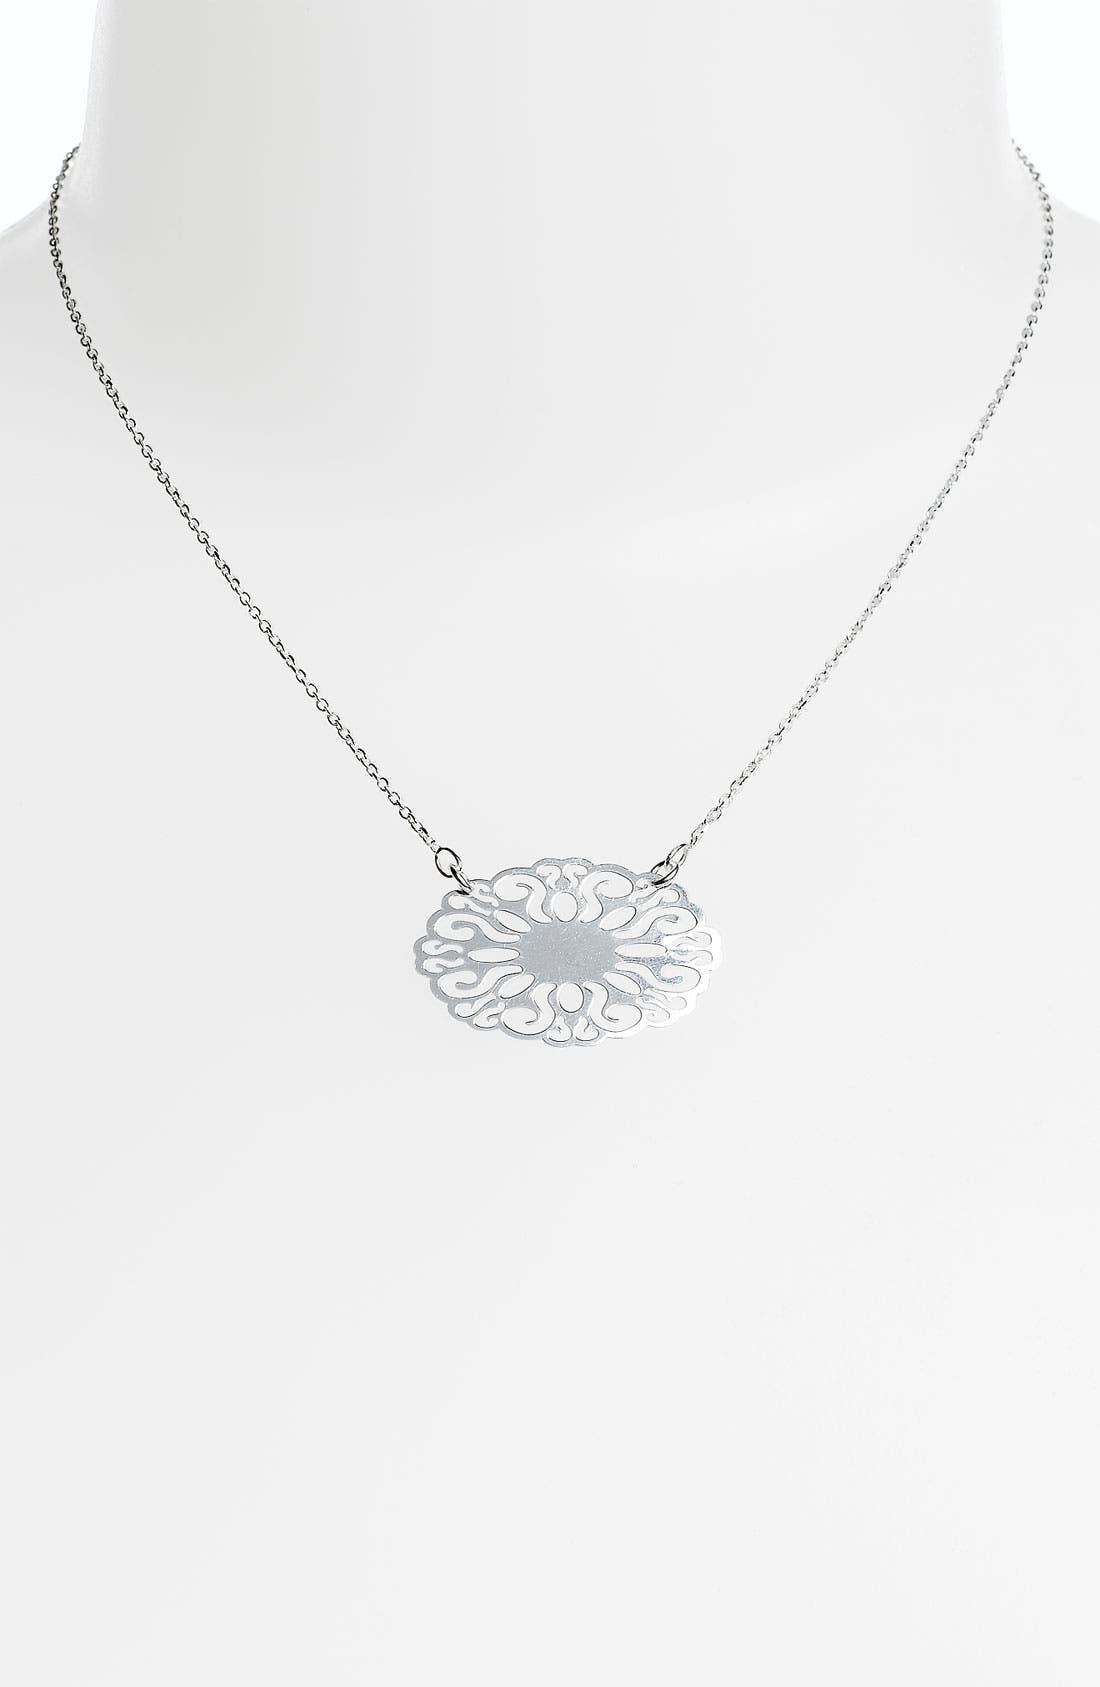 Alternate Image 1 Selected - Argento Vivo 'Sunburst' Small Pendant Necklace